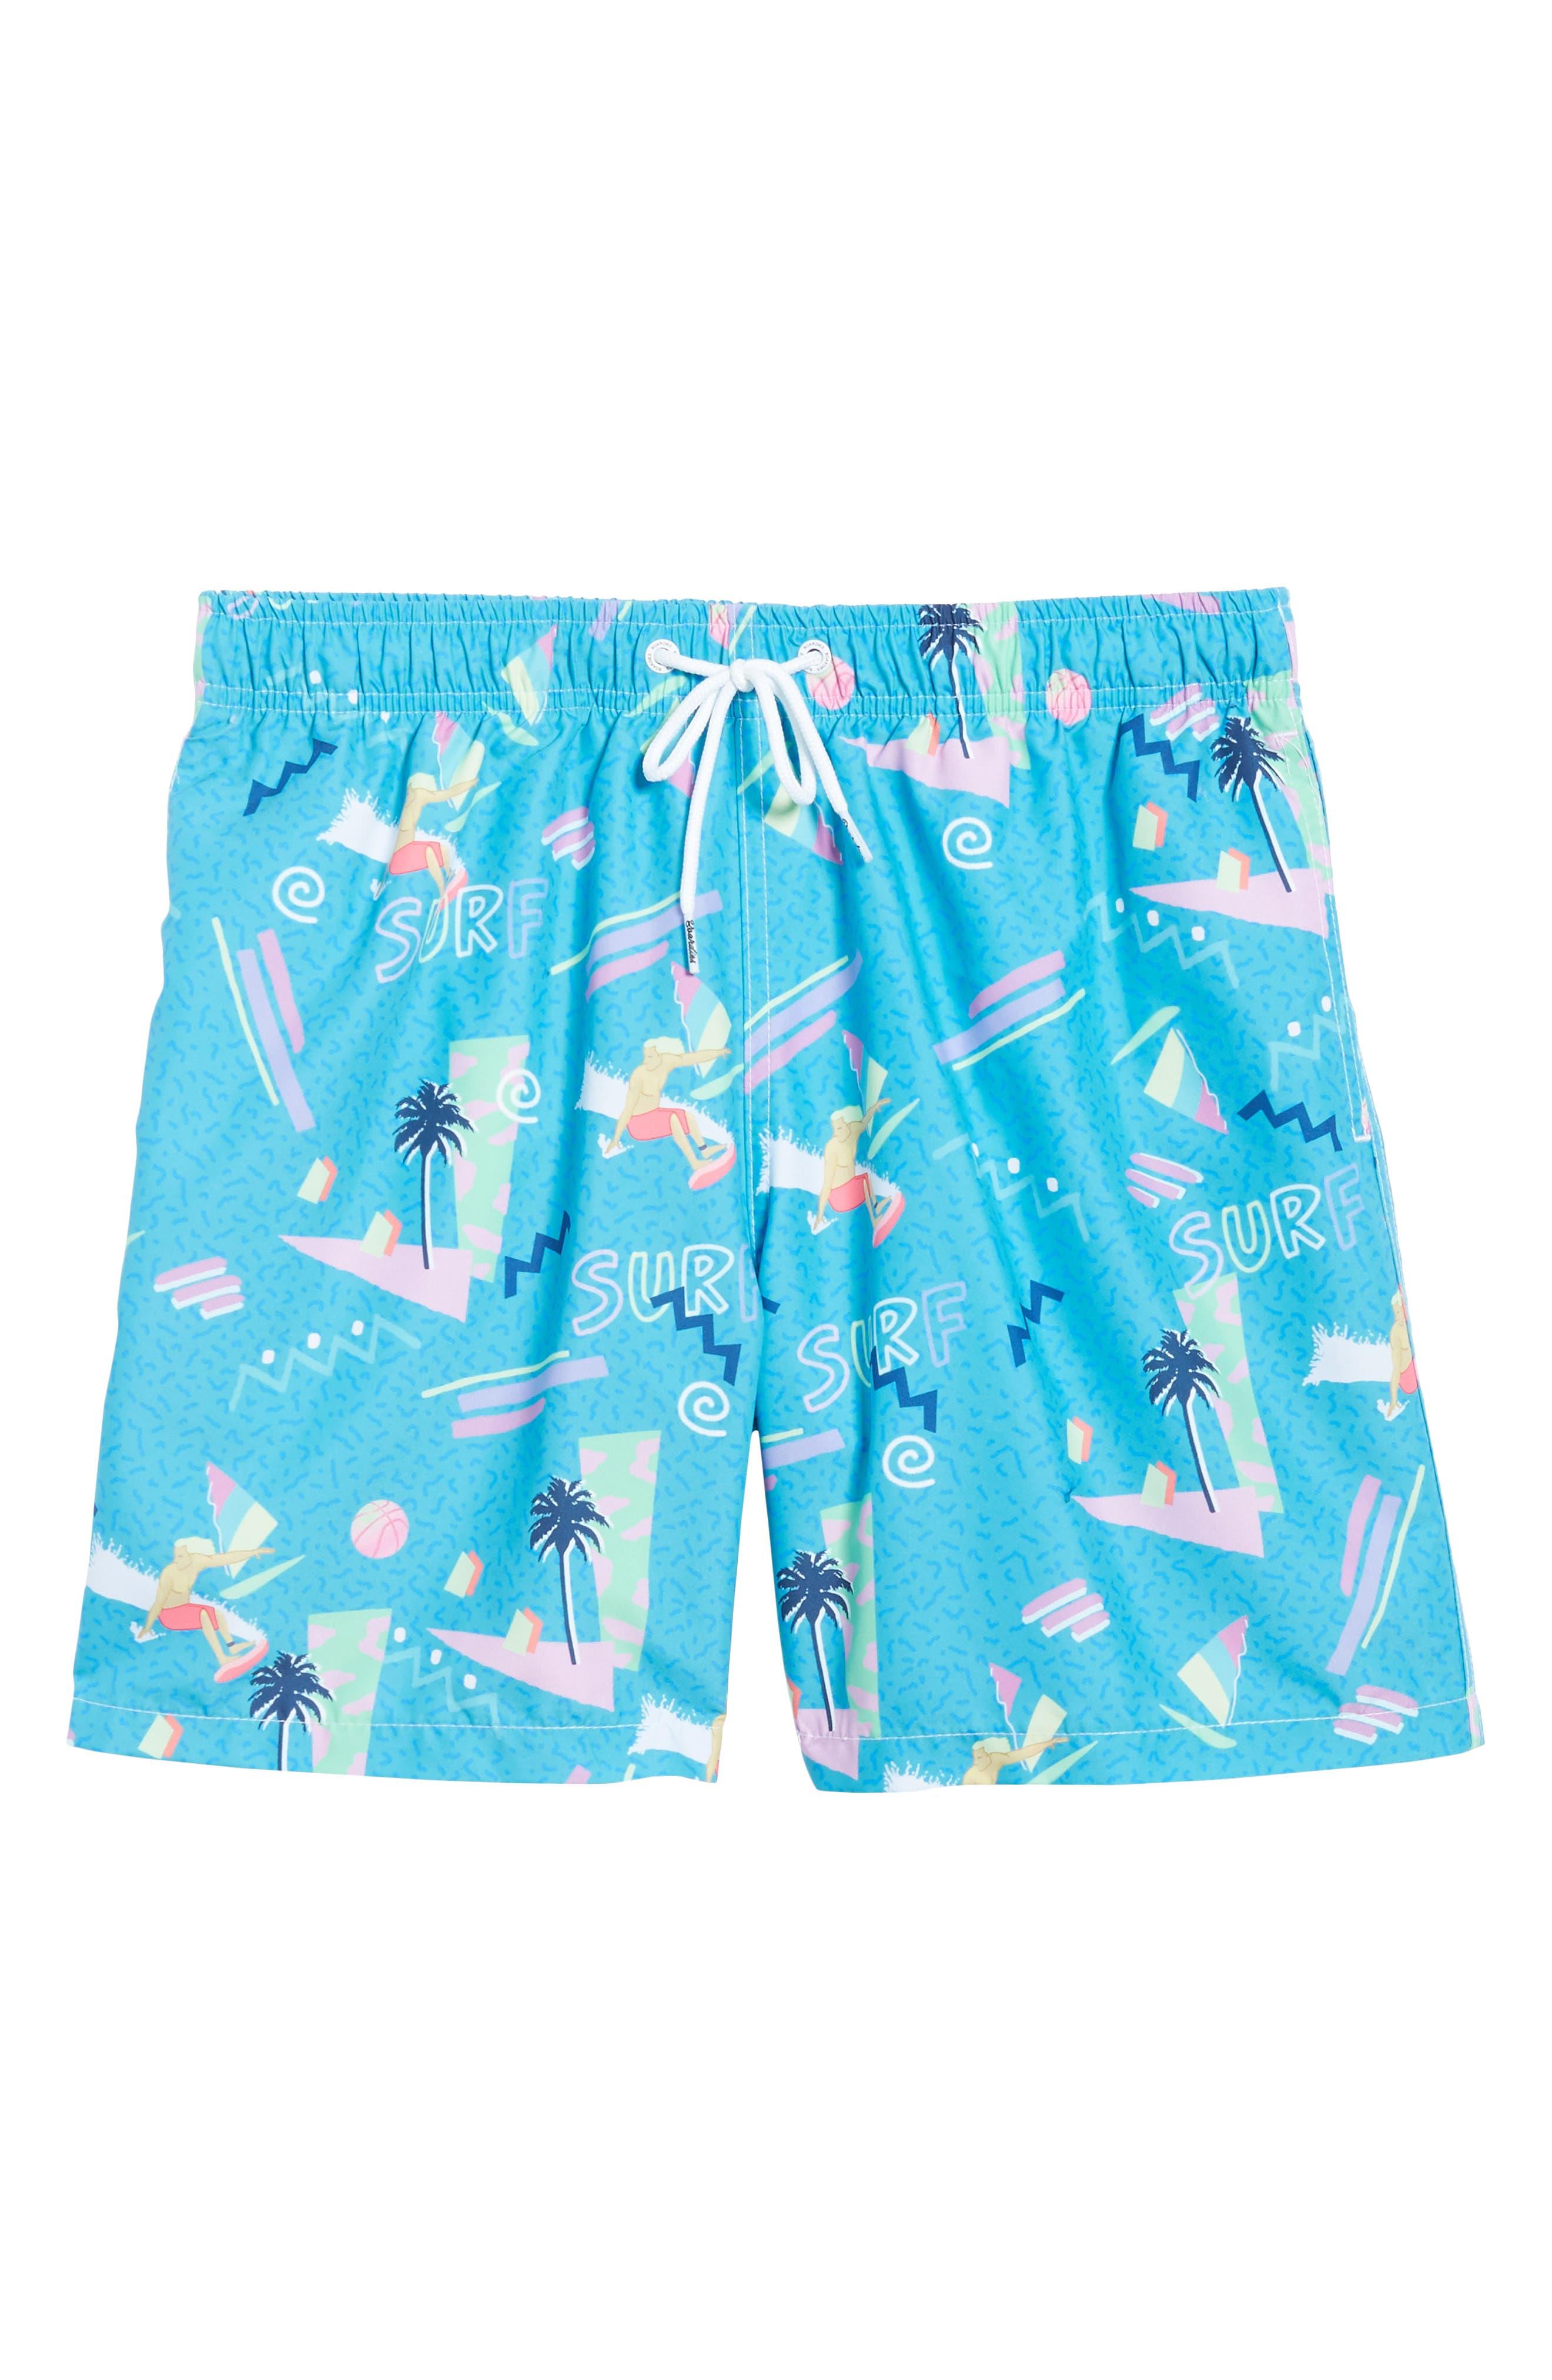 x Yoko Honda Print Swim Shorts,                             Alternate thumbnail 6, color,                             400